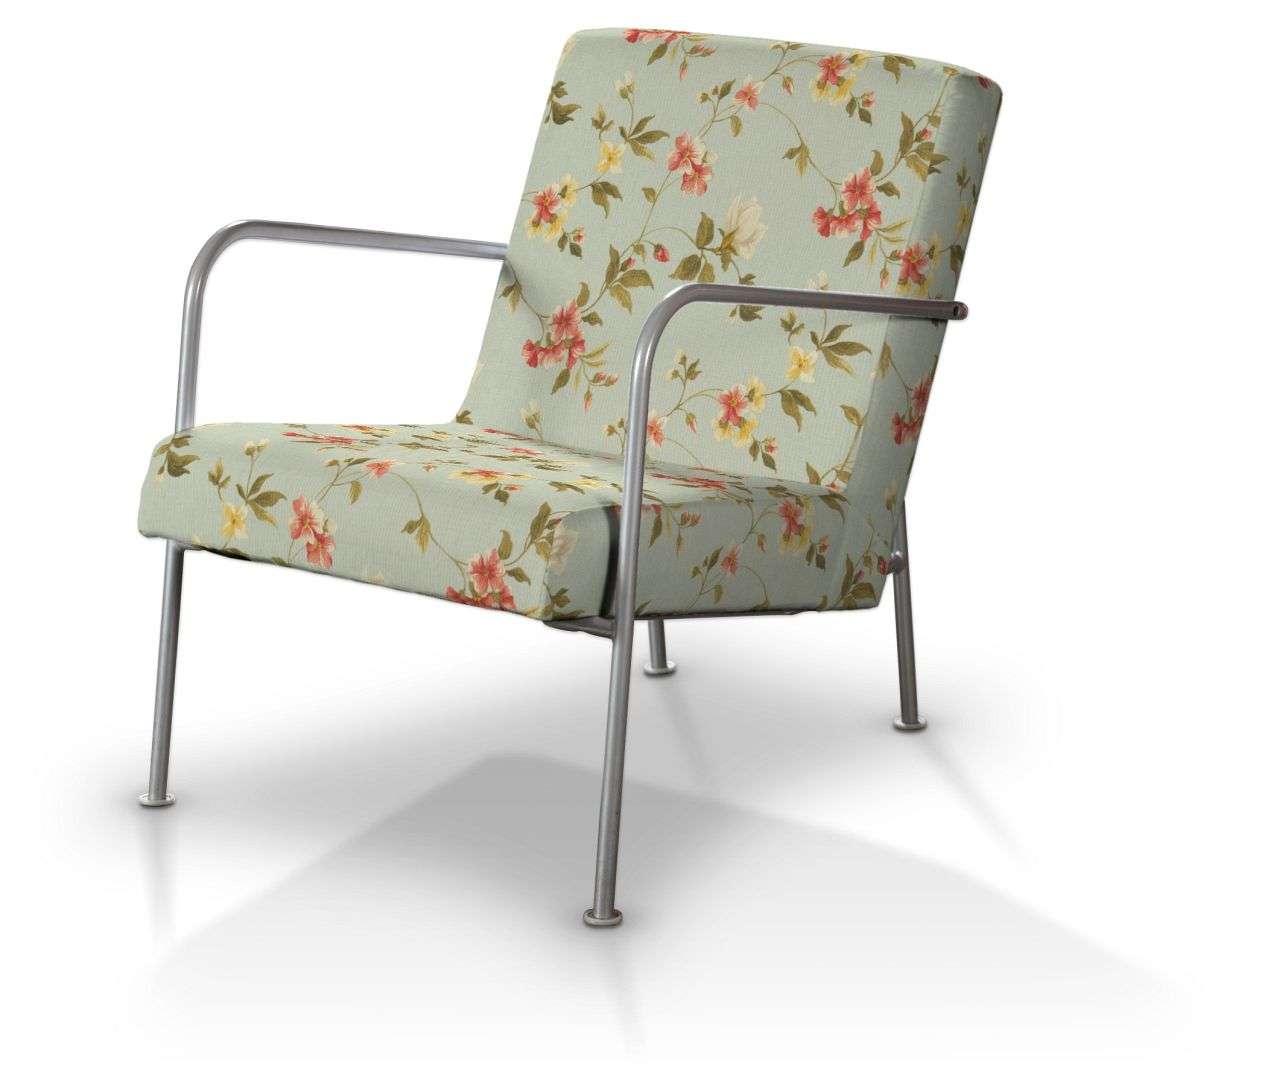 Ikea PS Sesselbezug Ikea Sessel  PS von der Kollektion Londres, Stoff: 124-65